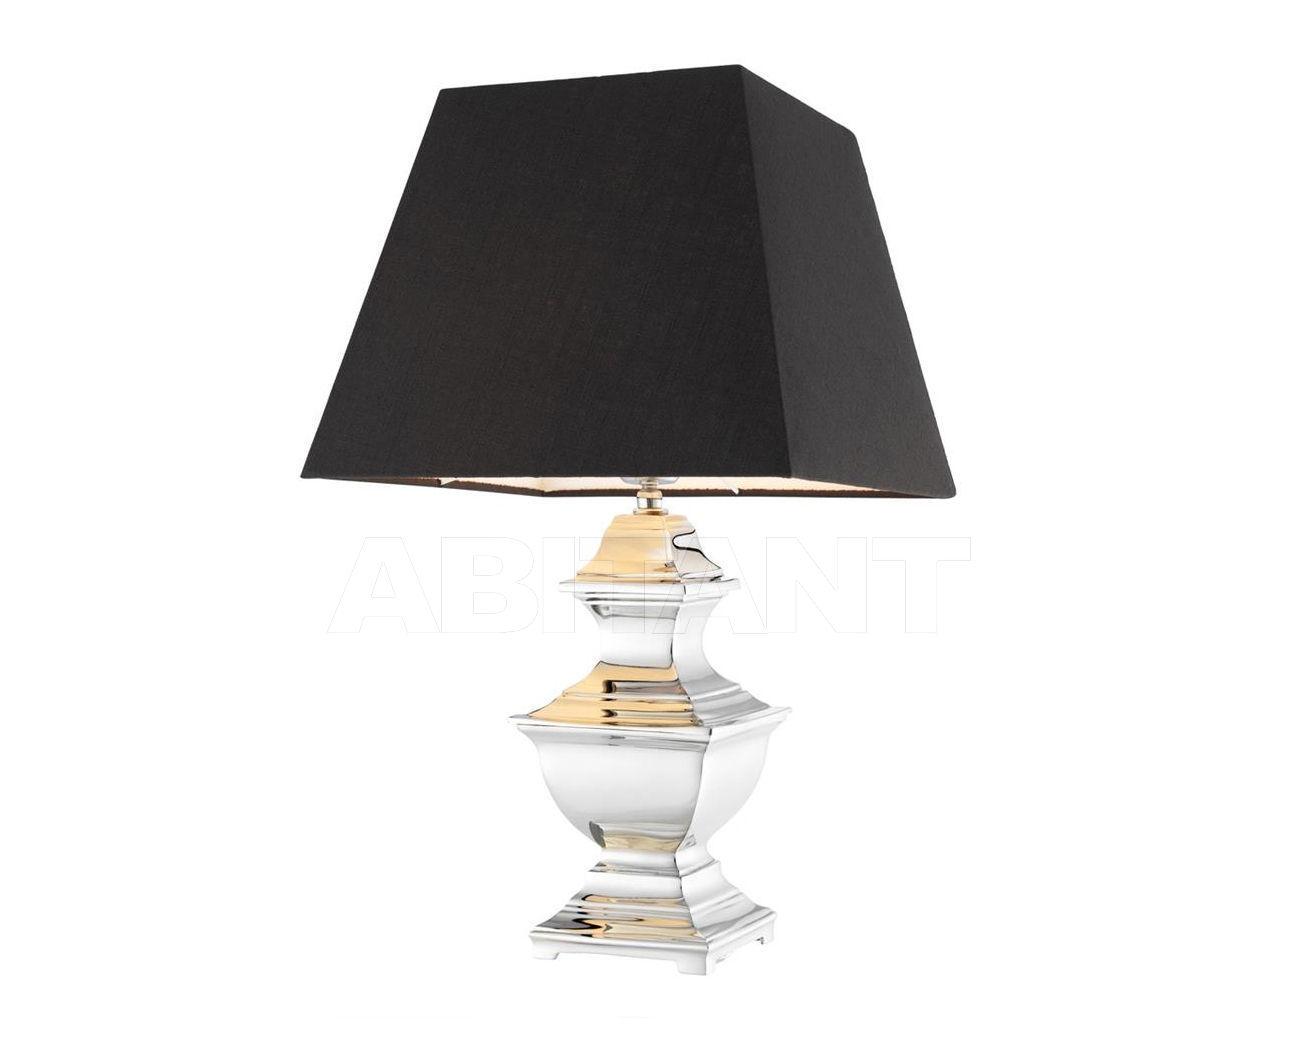 Купить Лампа настольная Maryland Eichholtz  Lighting 105191